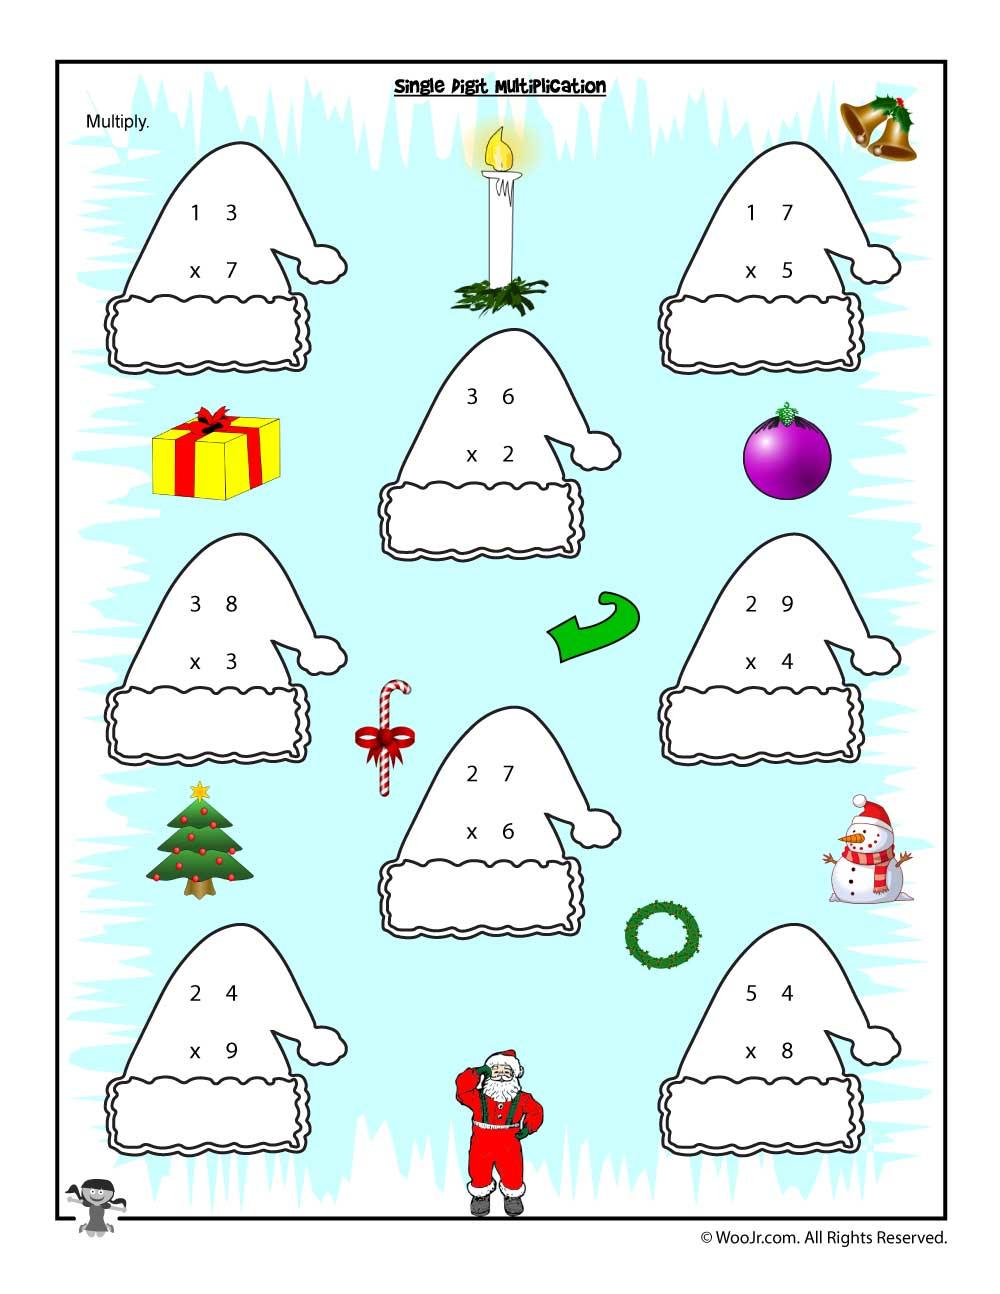 Single Digit Multiplication Christmas Worksheet